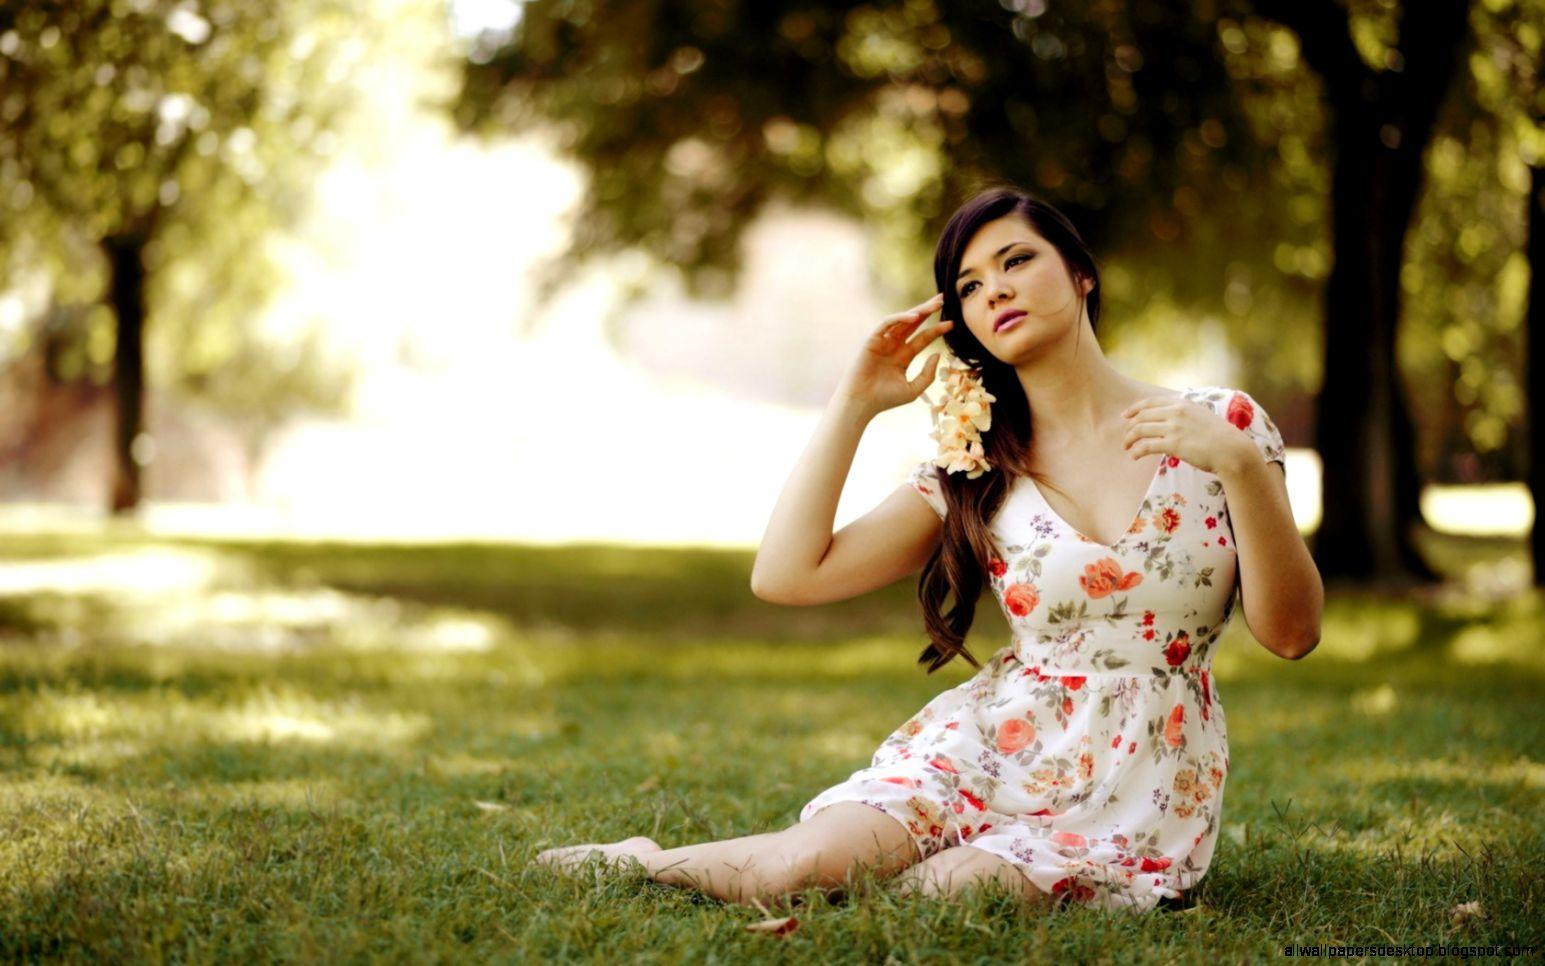 Lovely Girl Dress Hd Wallpaper  Best Desktop Wallpapers